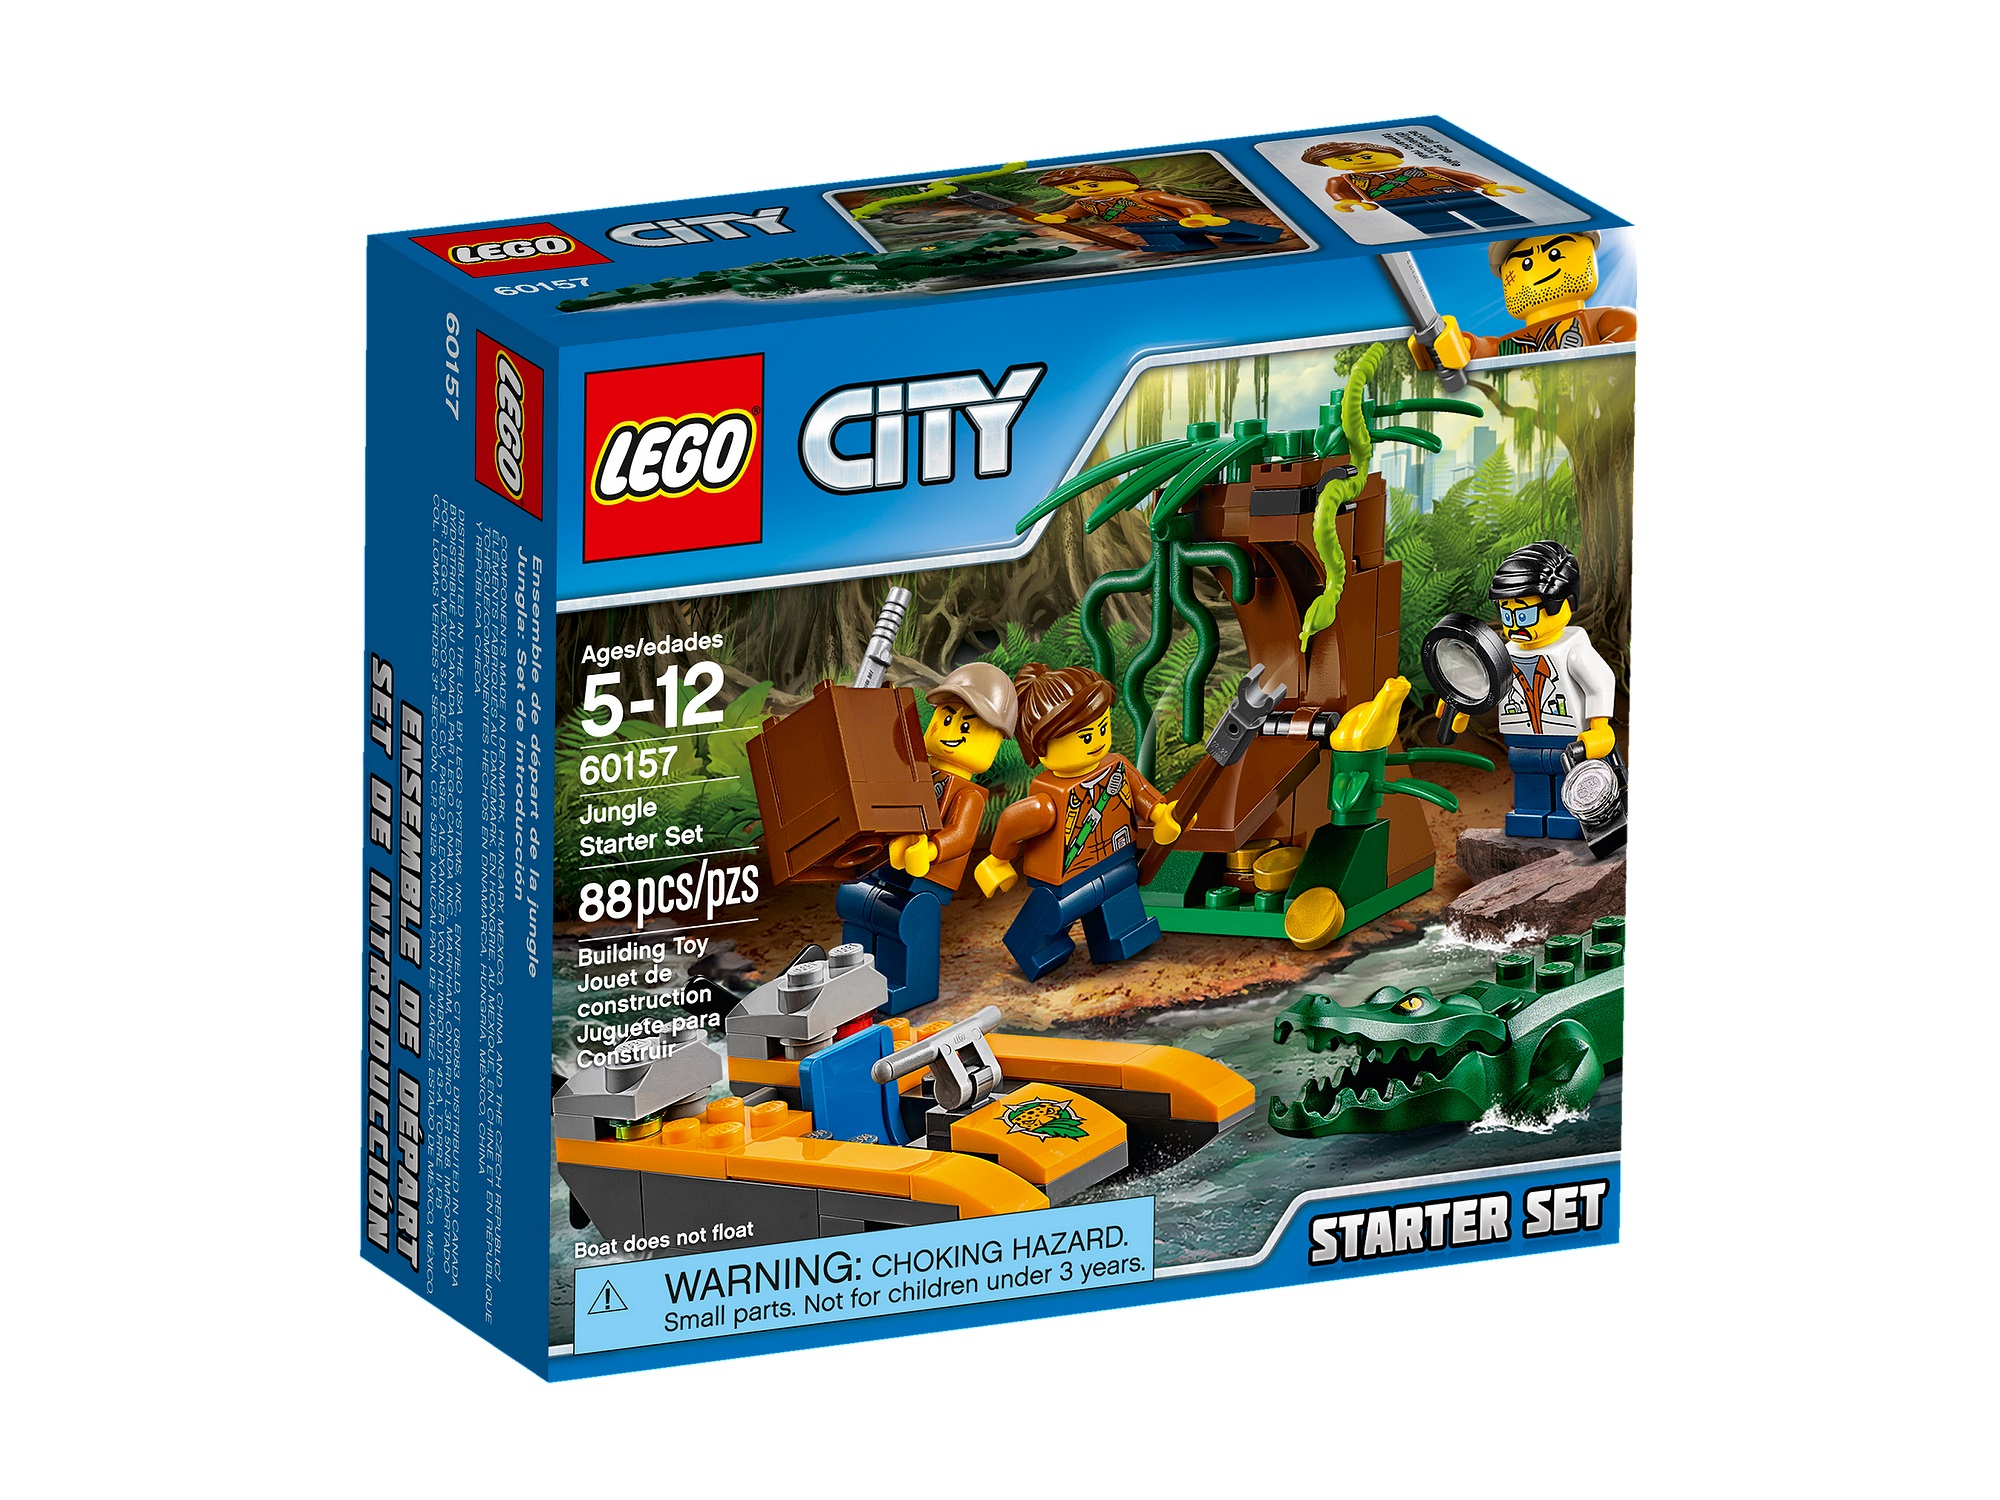 Preview: LEGO City Jungle 2017 sets